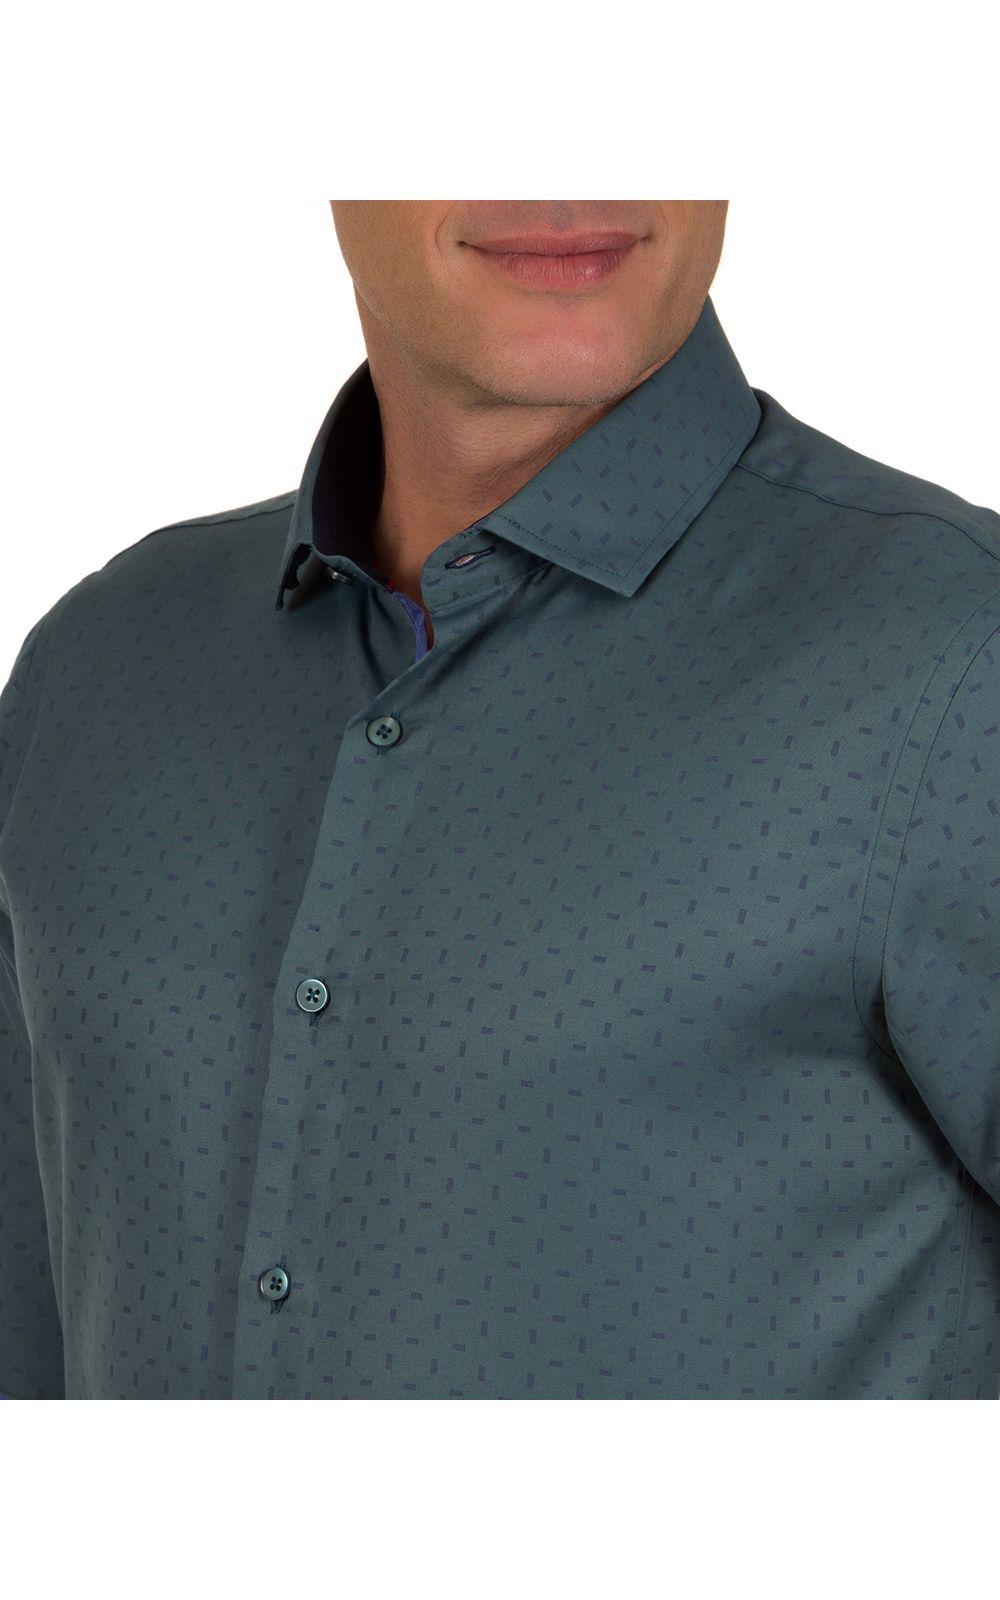 Foto 3 - Camisa Social Masculina Azul Escuro Detalhada